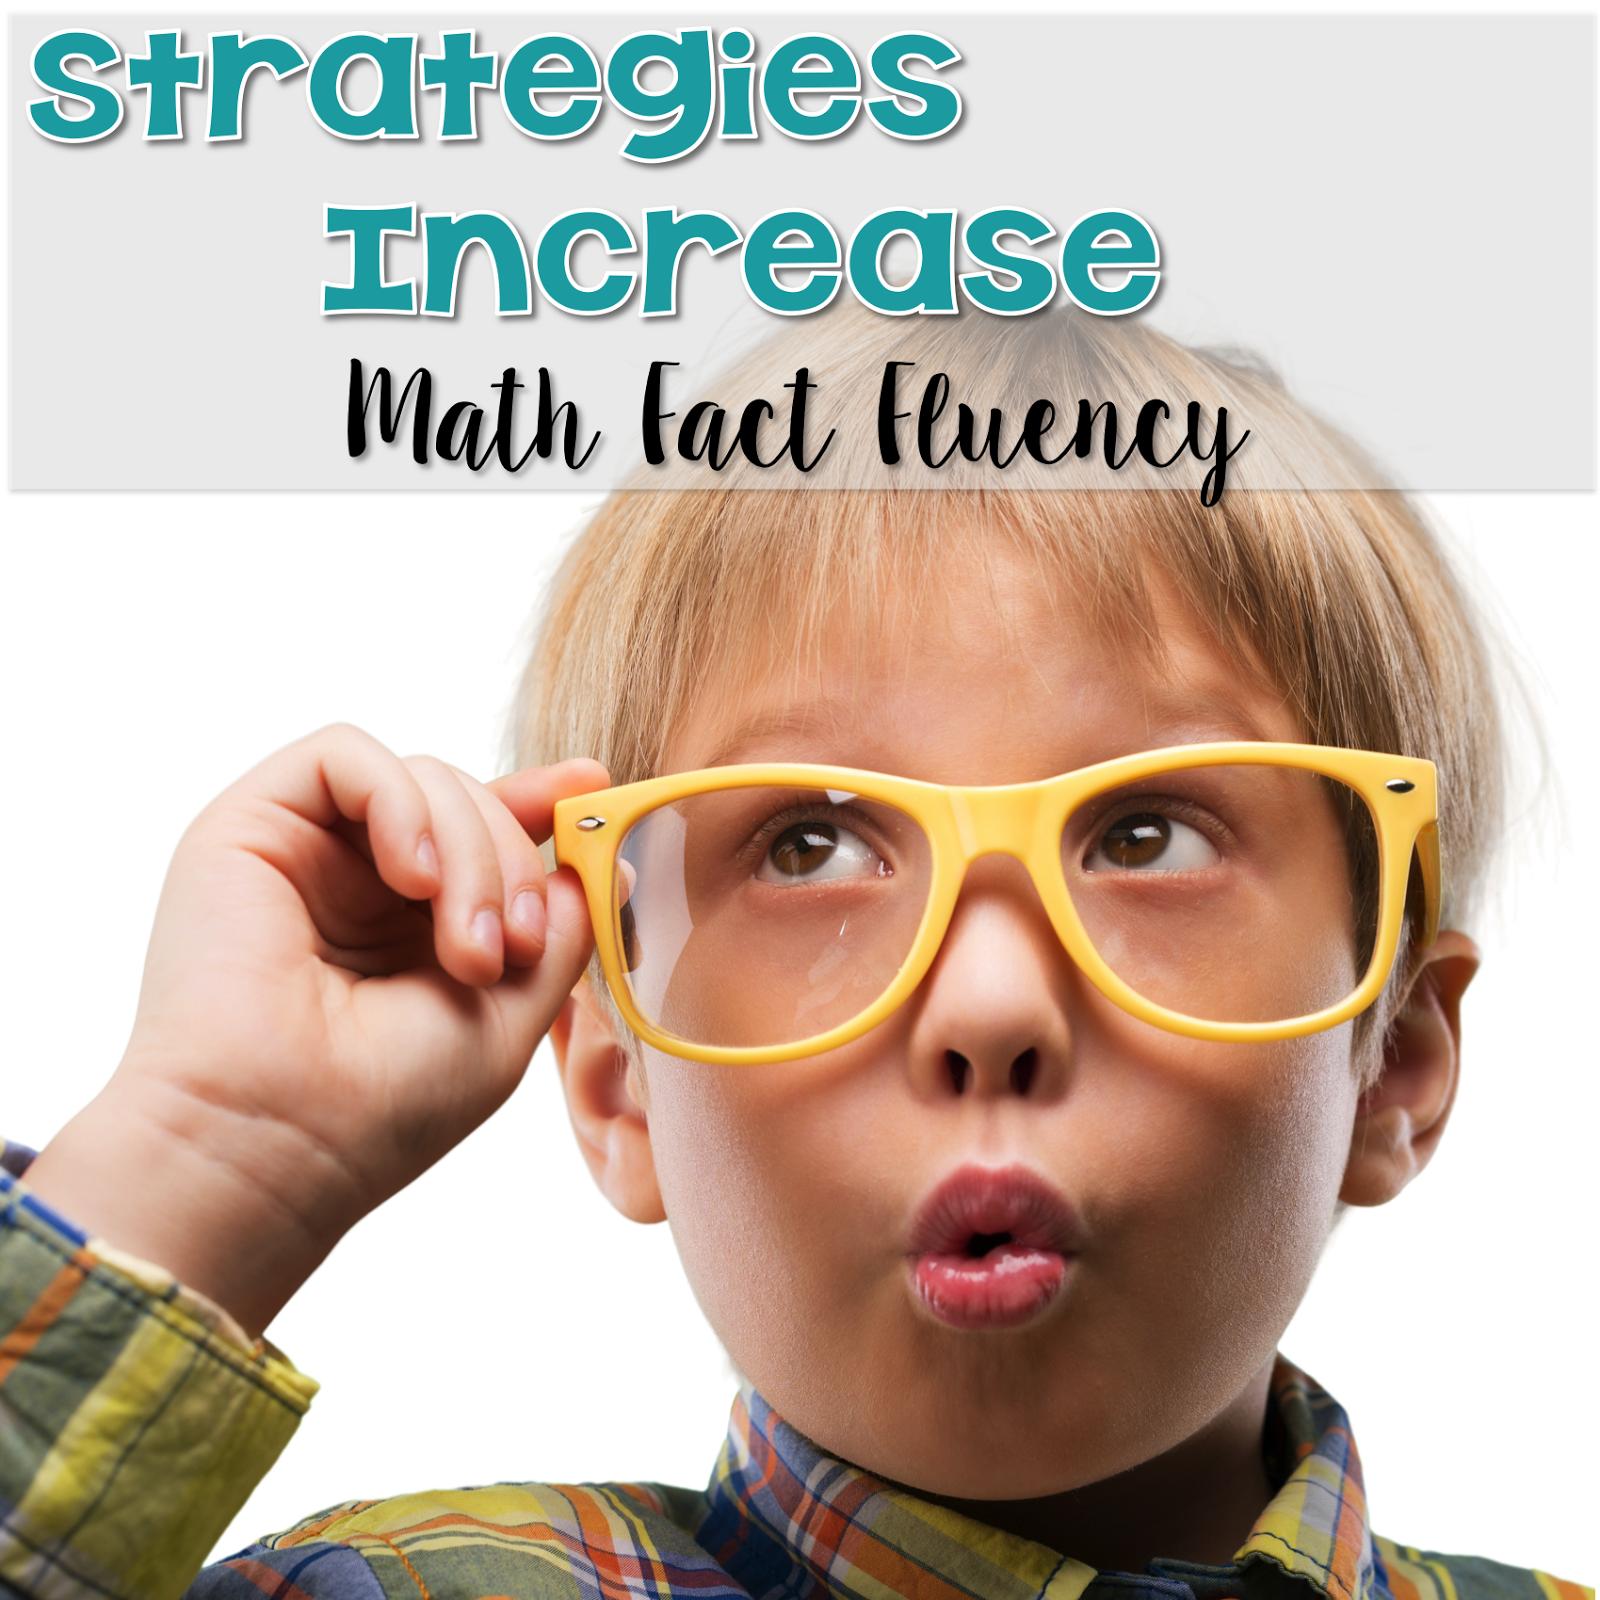 Strategies That Increase Math Fact Fluency